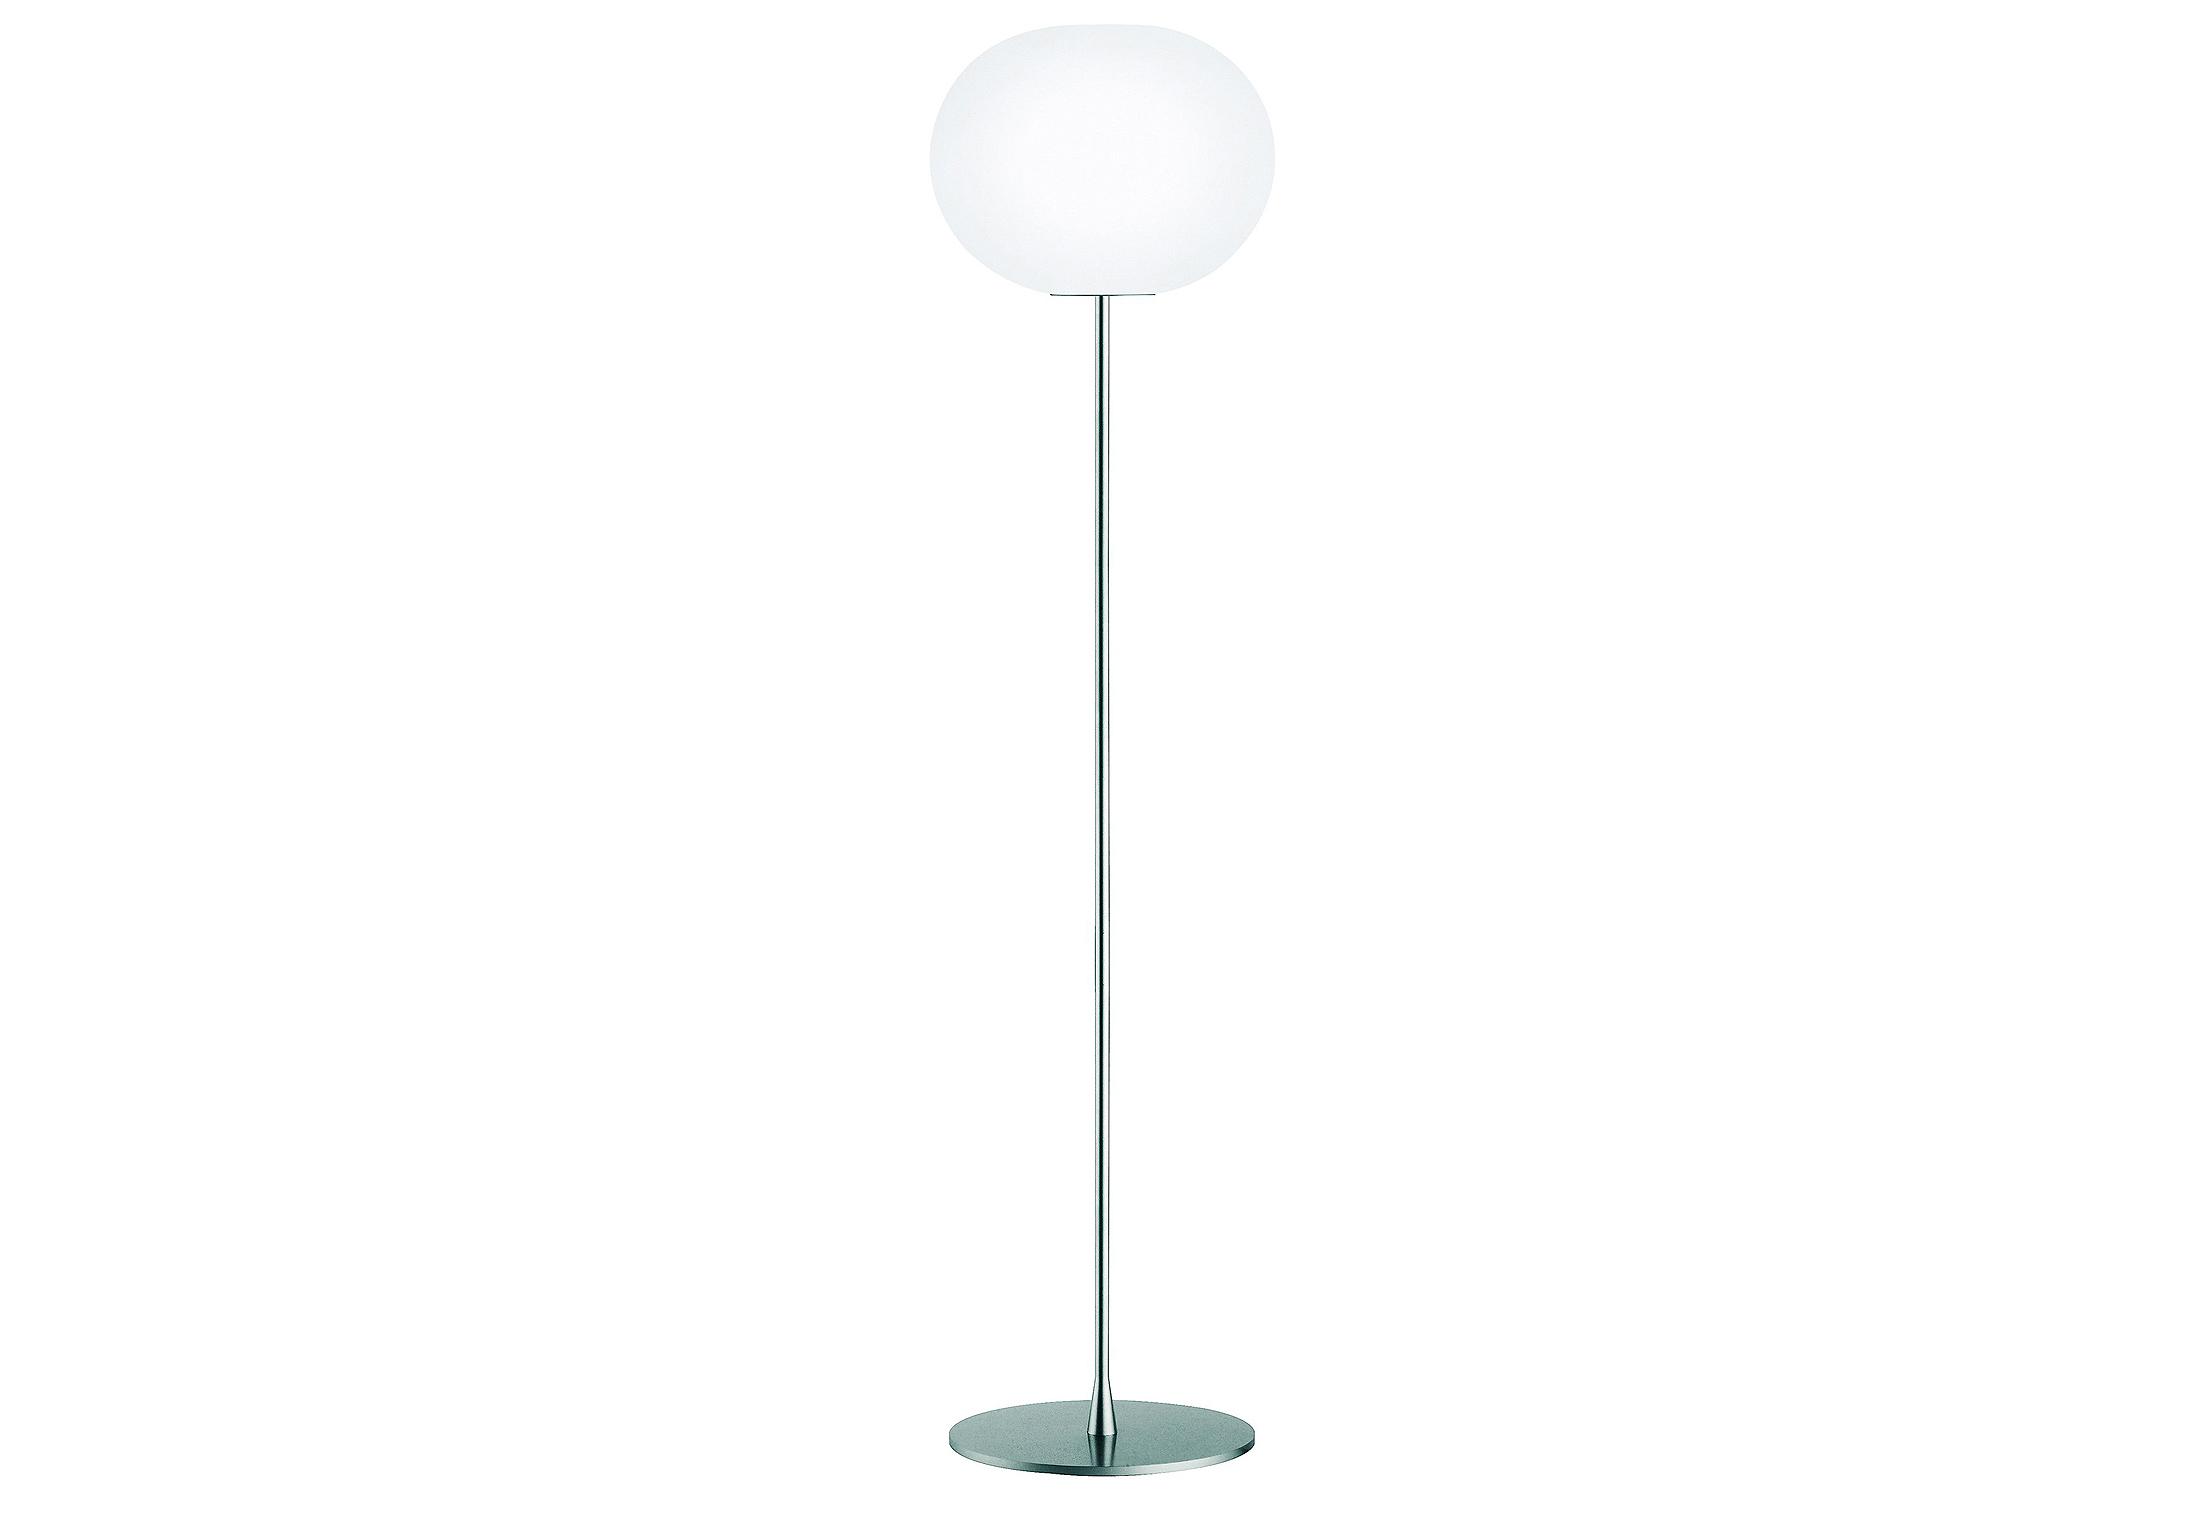 glo-ball-f3-floor-lamp-1 Elegantes Flos Glo Ball S Dekorationen